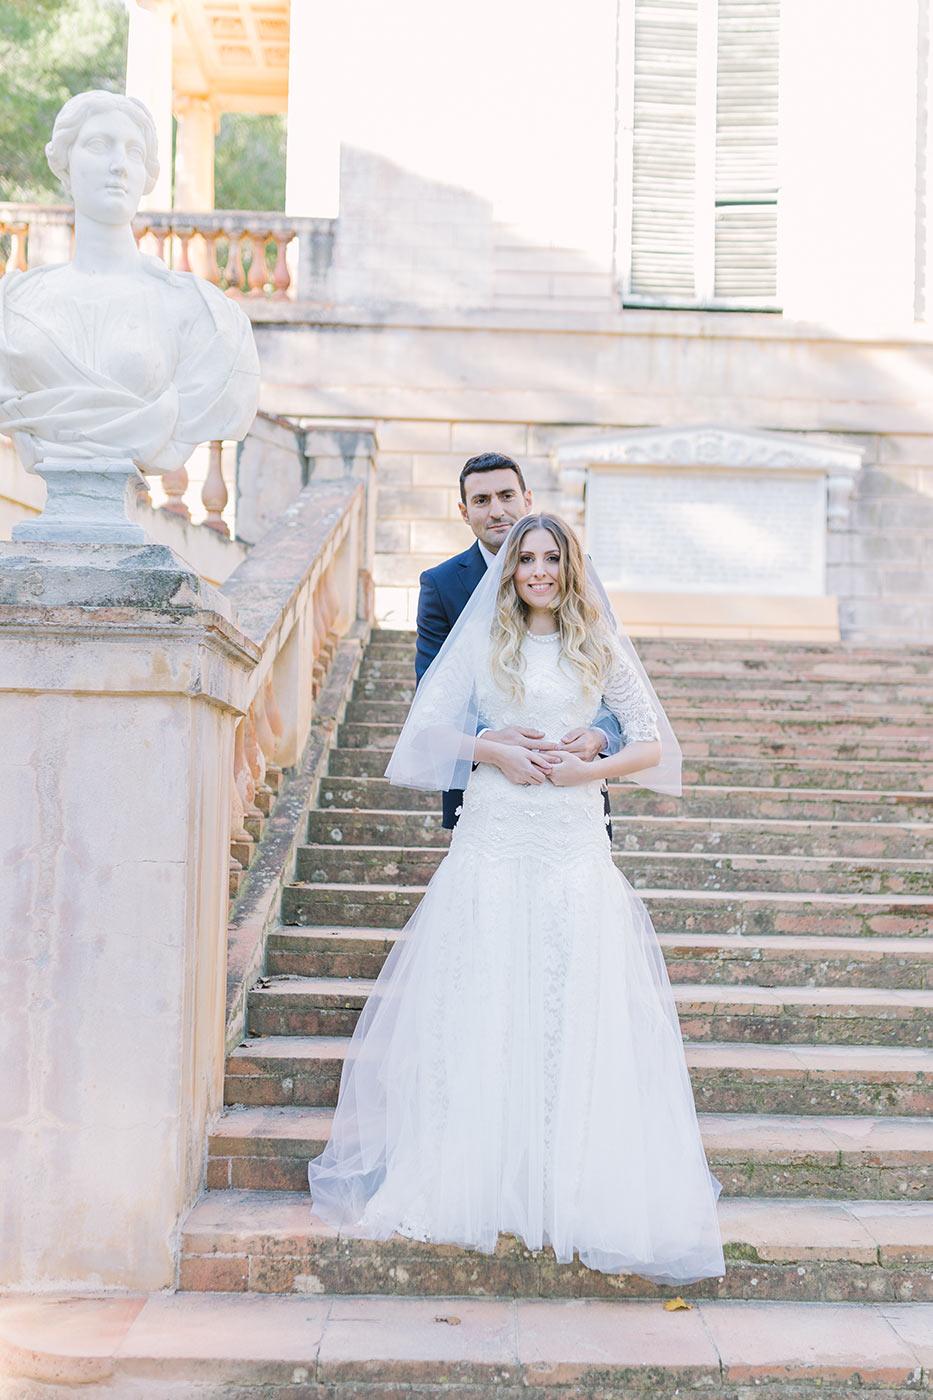 Engagement photographer Barcelona | Fine Art Photographer | Lena Karelova Photography | Destination Wedding Photographer Barcelona |Film Wedding Photographer